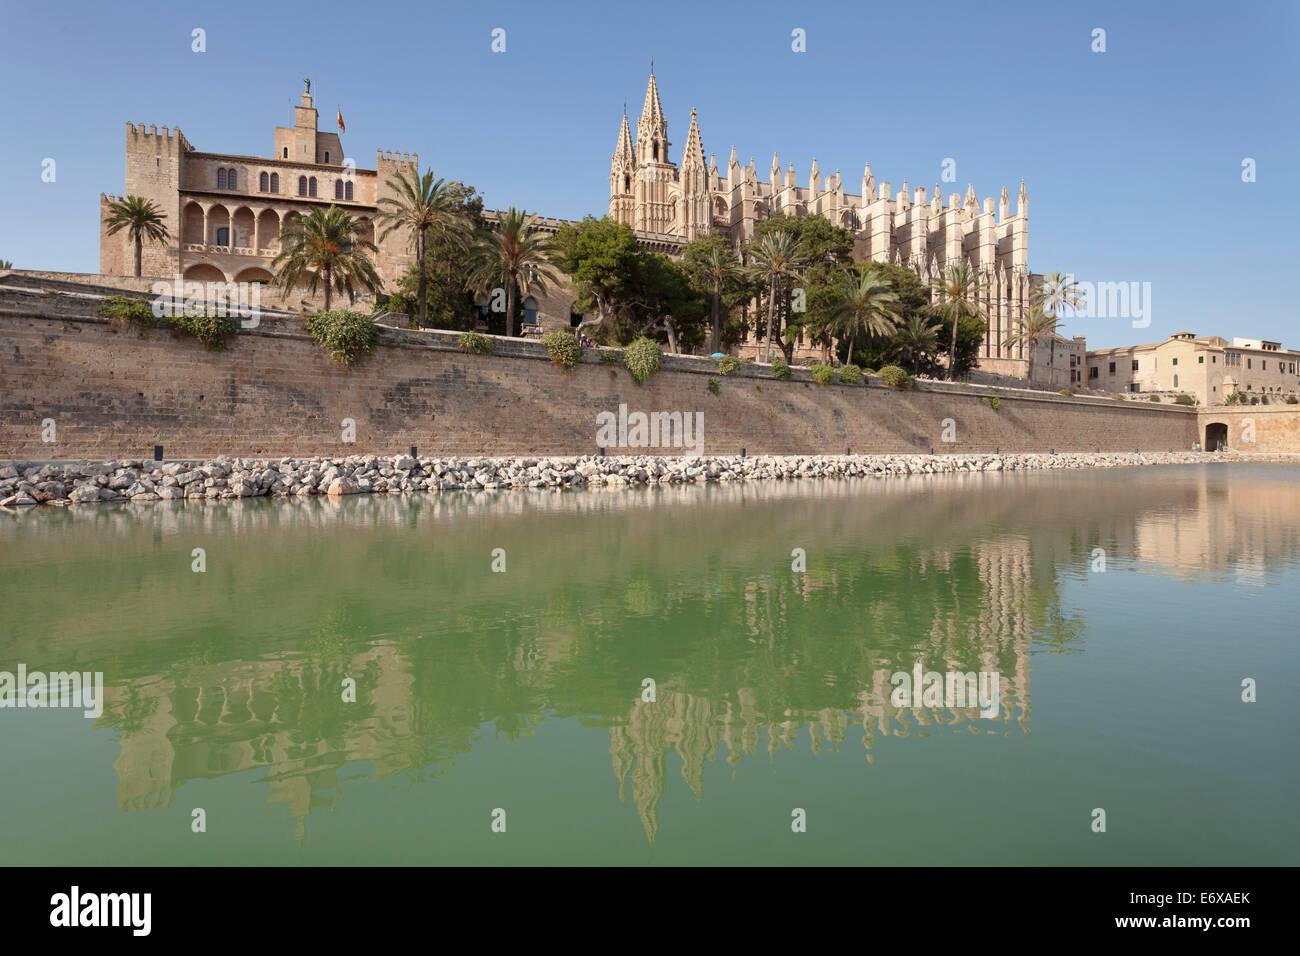 Kathedrale von Palma an der marine Park Parc De La Mar, Palma de Mallorca, Mallorca, Balearen, Spanien Stockbild